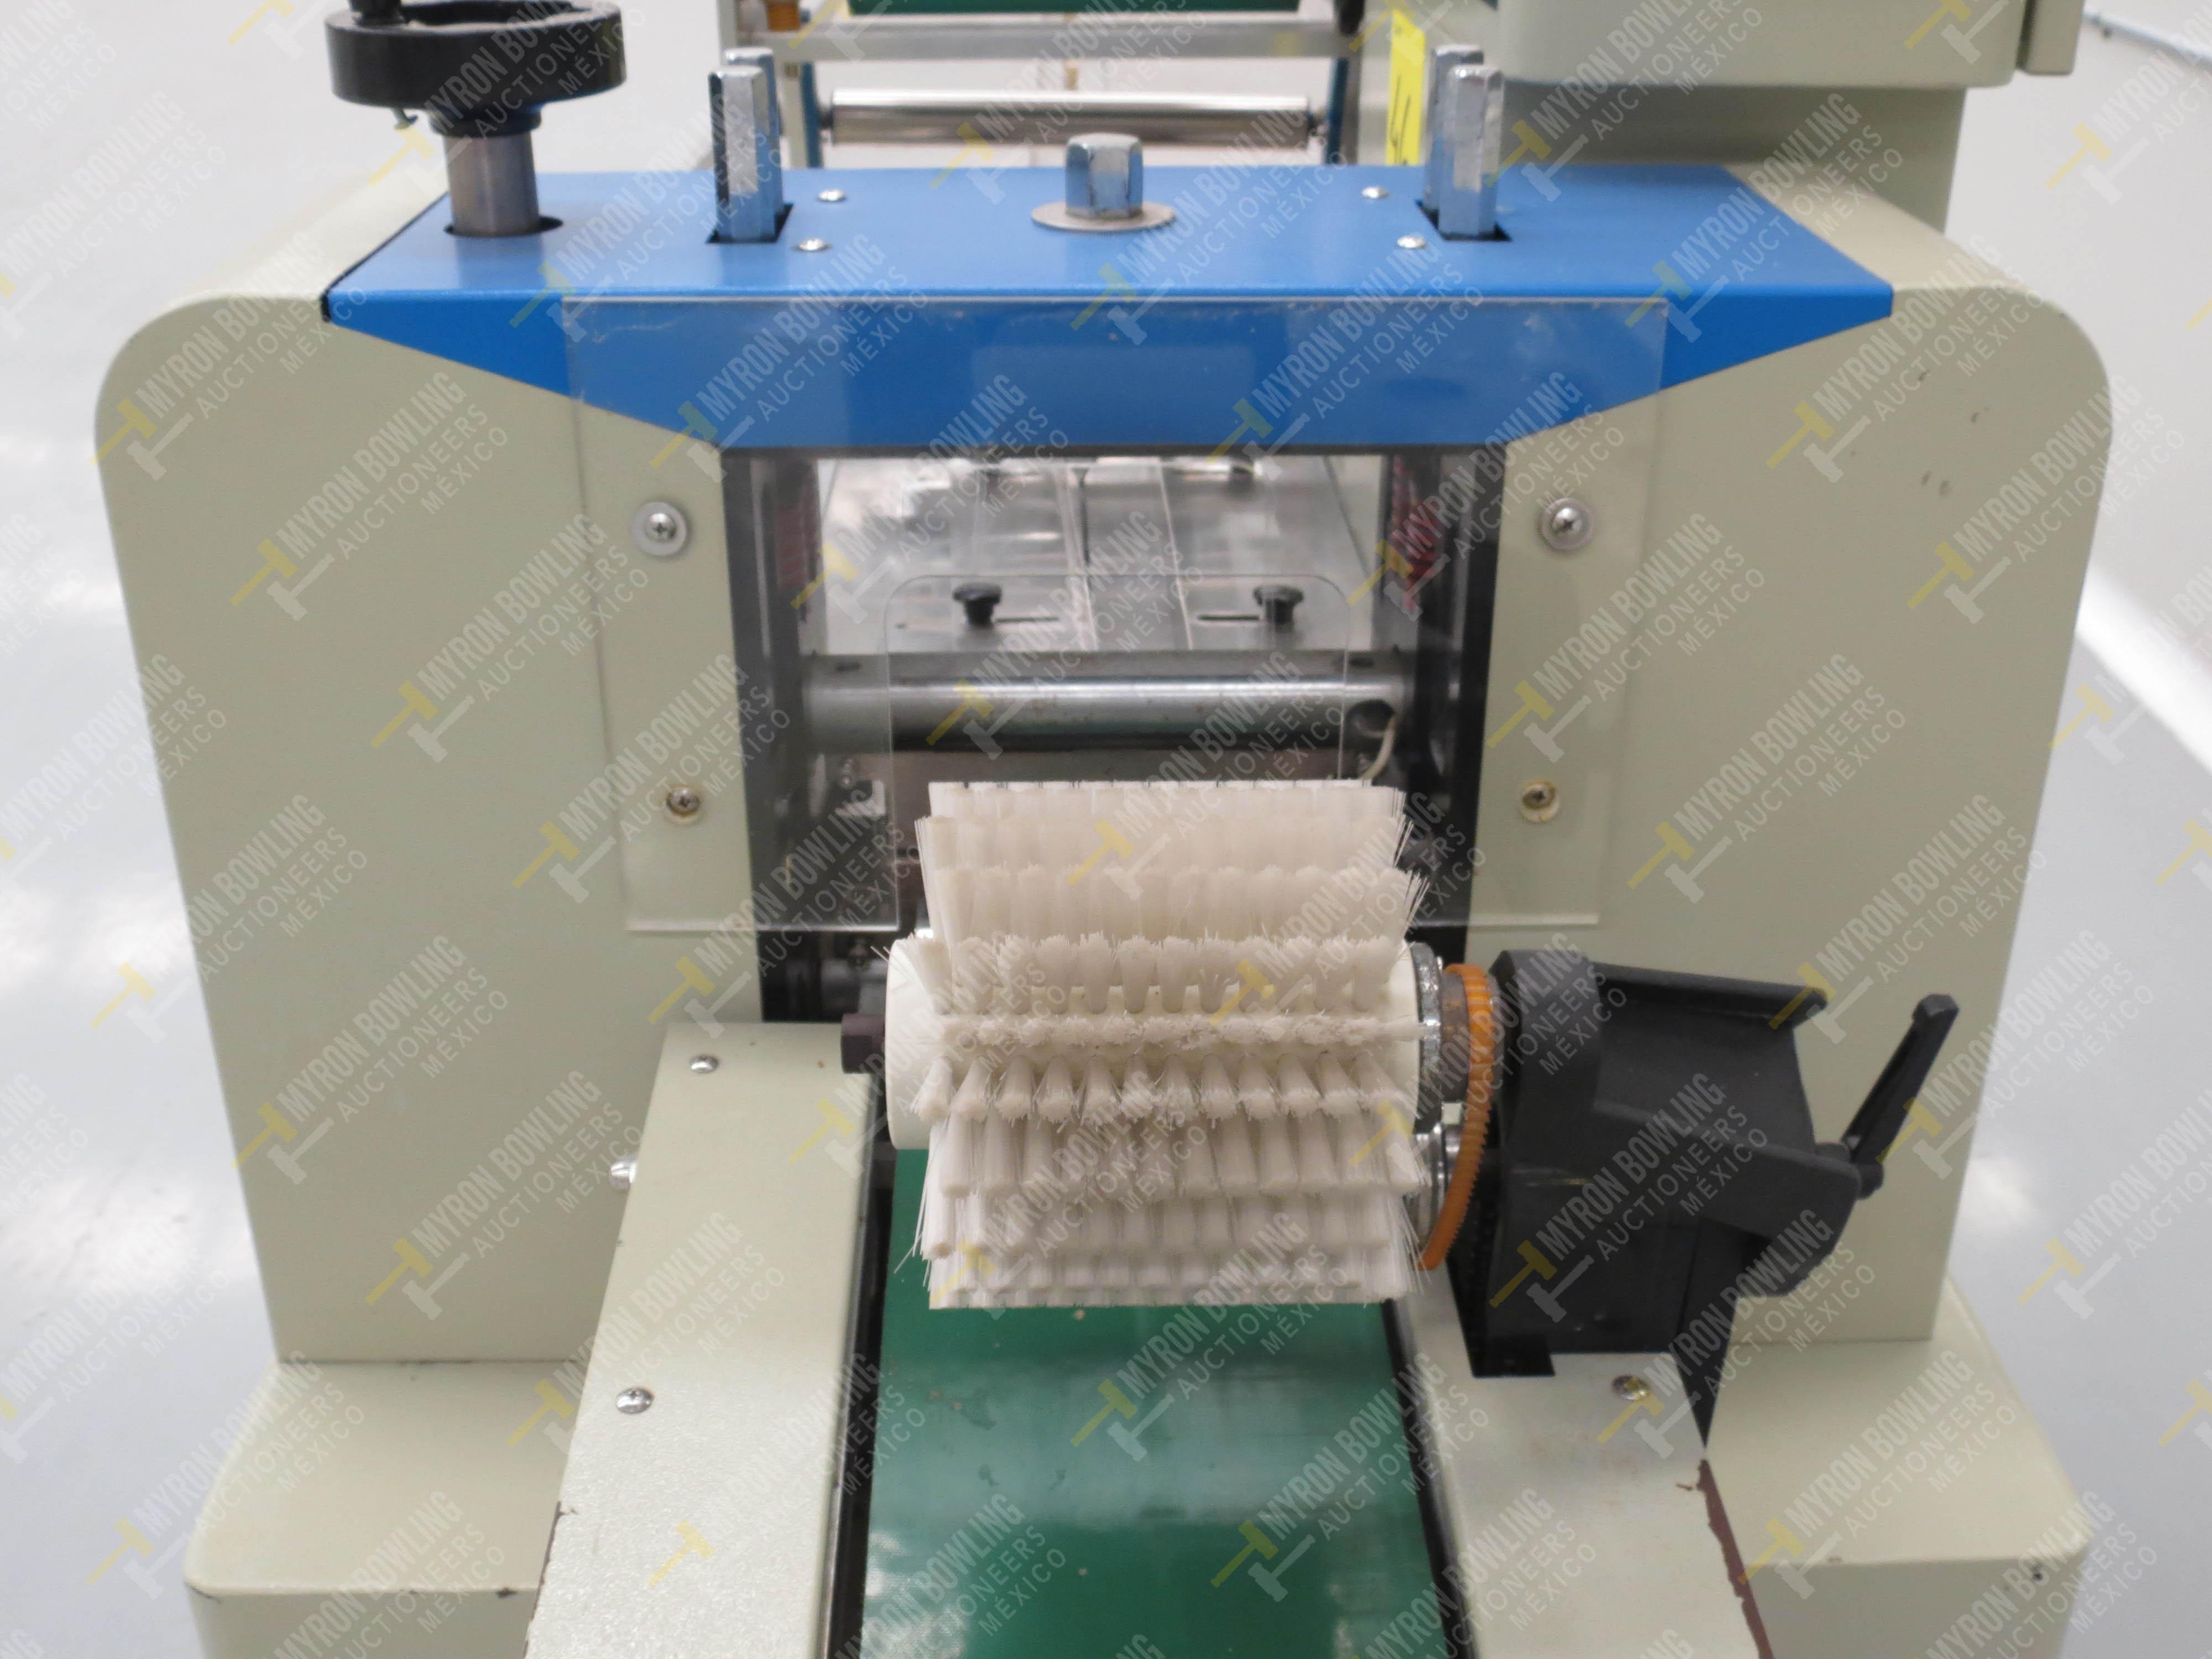 Máquina empacadora automática tipo almohadilla marca Shandong Saixin Inflating Machinery … - Image 8 of 9